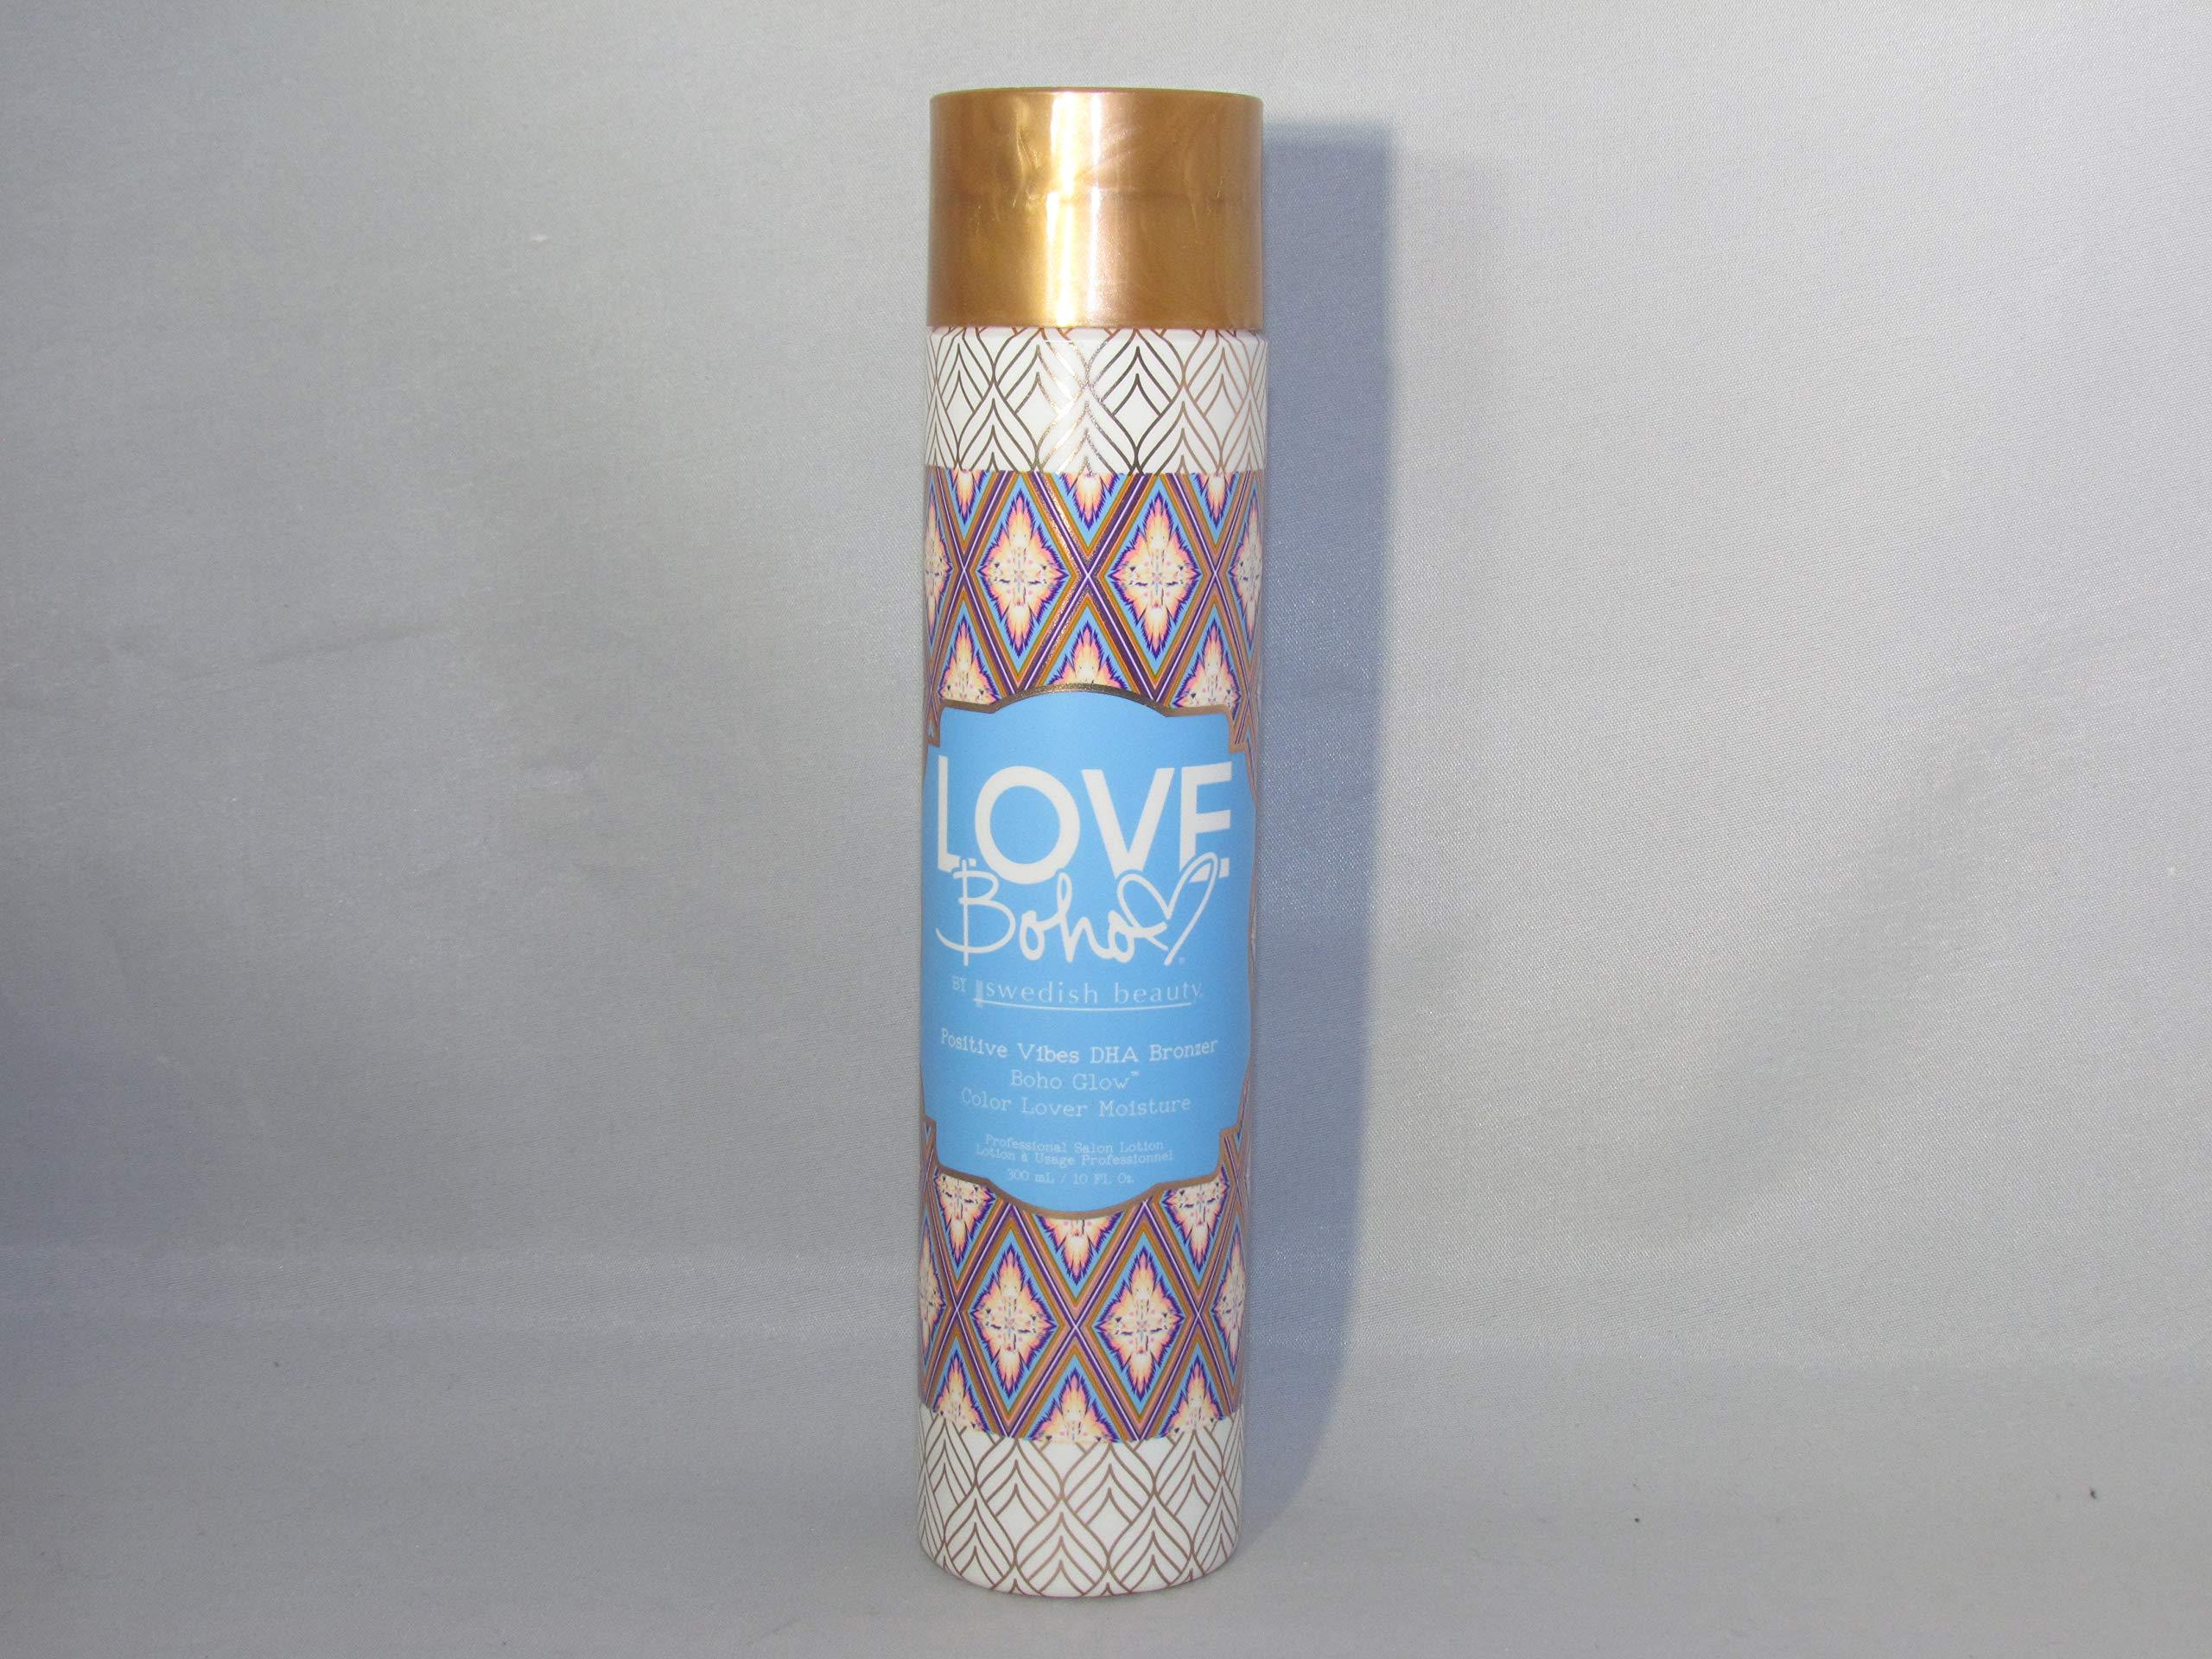 Swedish Beauty LOVE BOHO POSITIVE VIBES DHA Bronzer - 10 oz. by Swedish Beauty